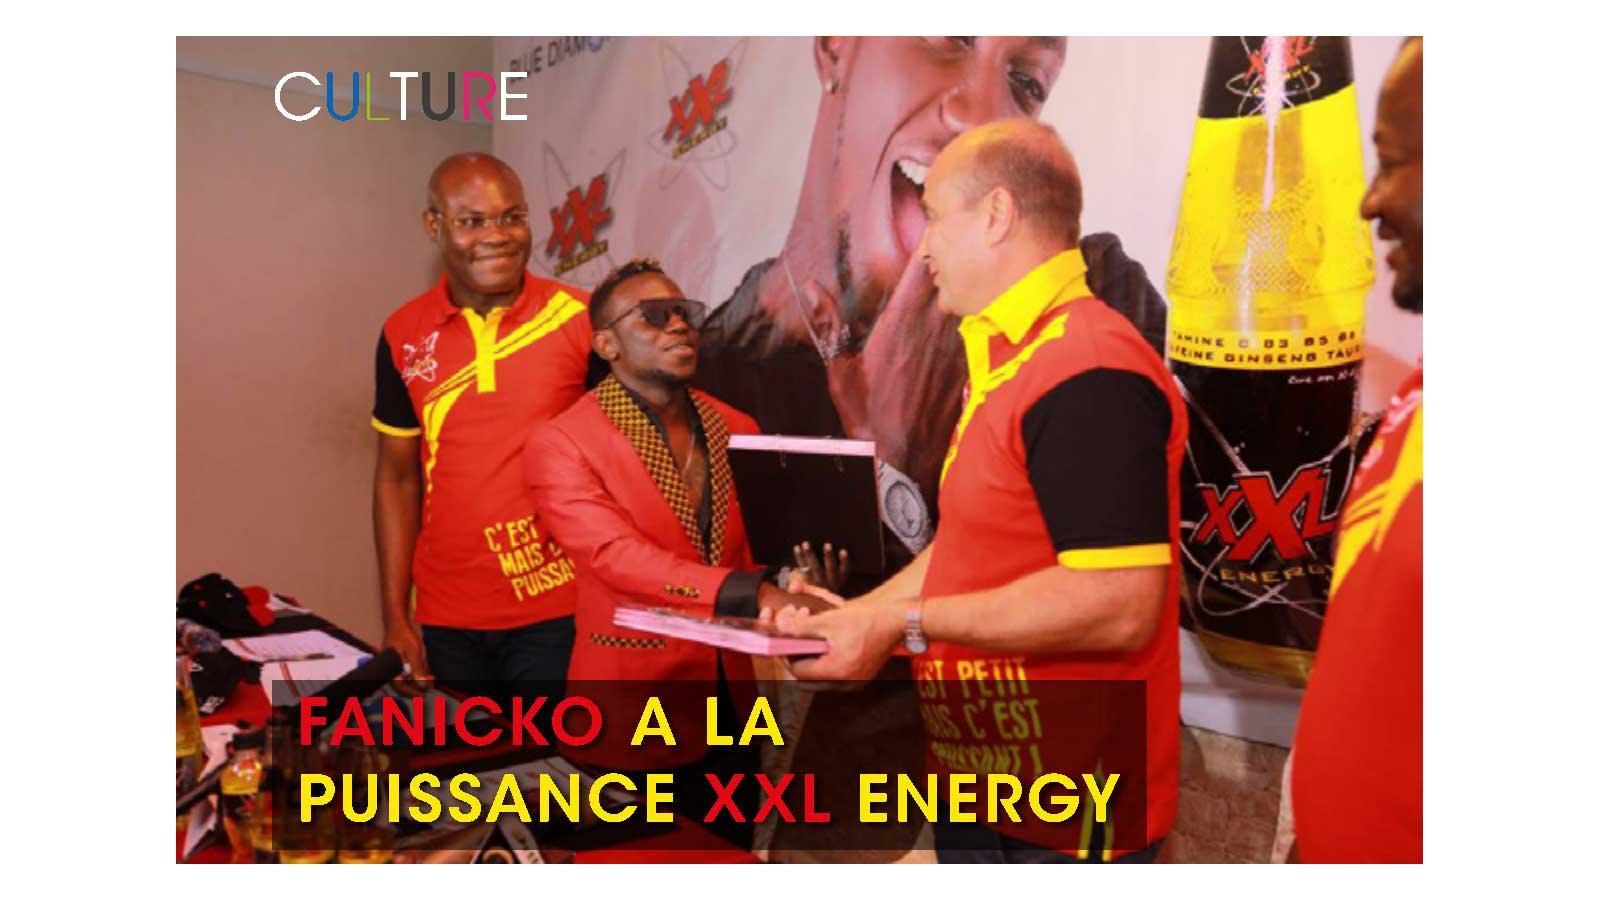 Fanicko, puissance XXL Energy